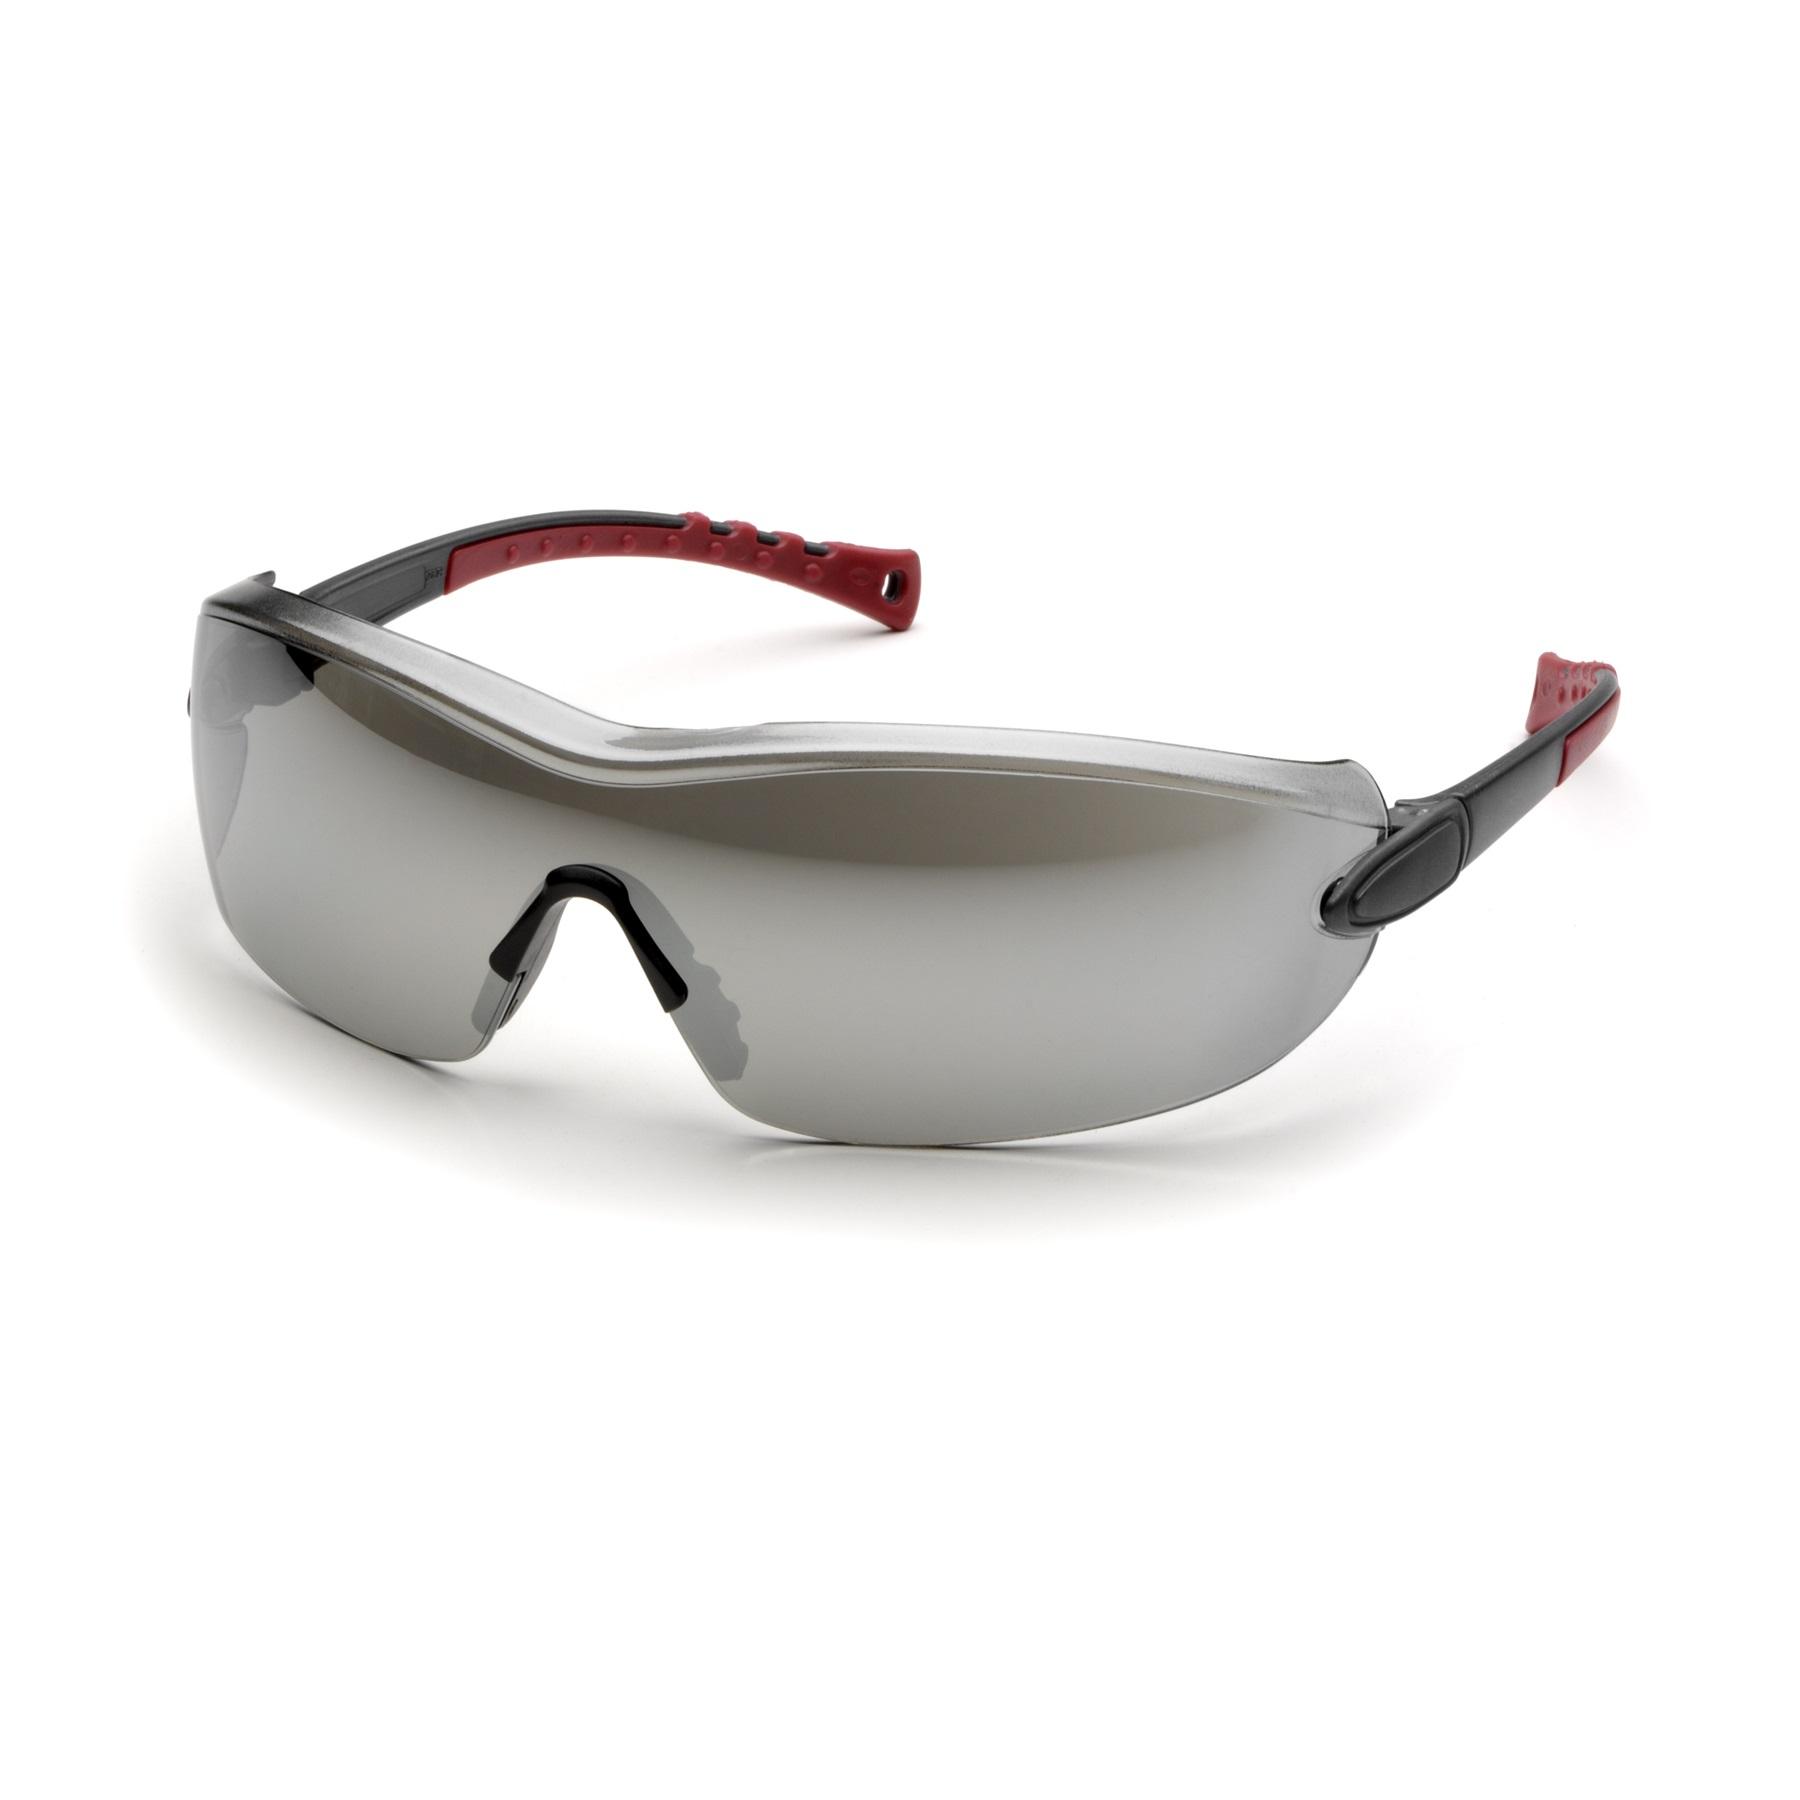 Elvex Neutron Anti-Fog Safety Glasses SG-30